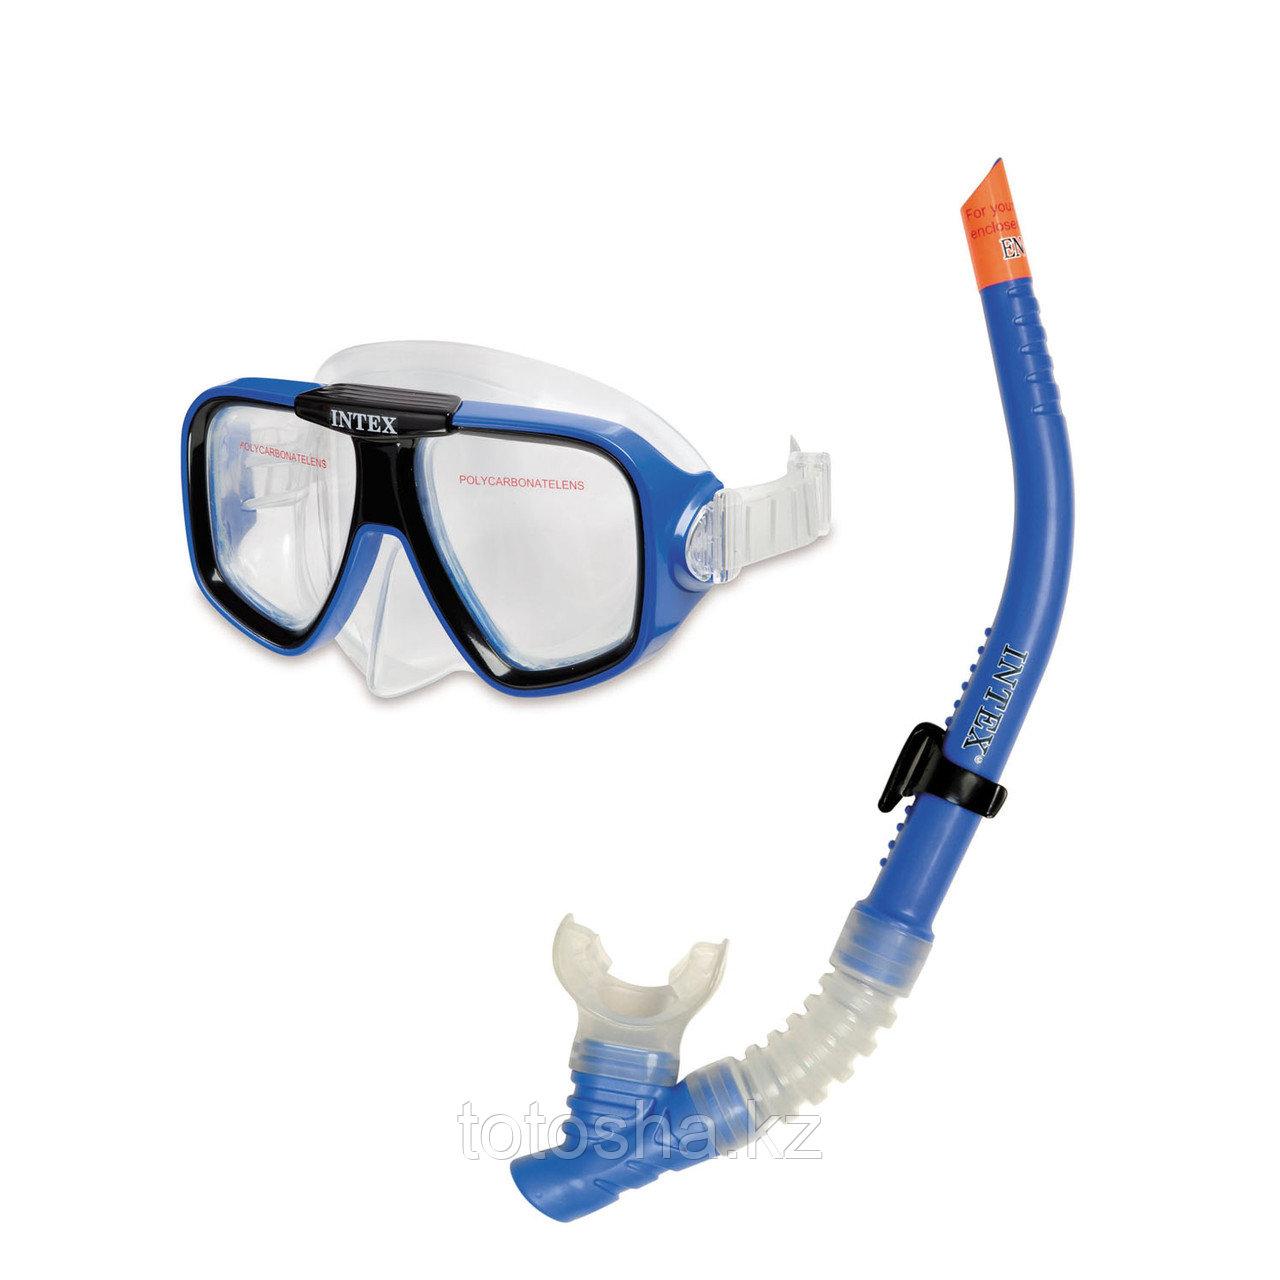 55948 Intex набор для плавания (маска + трубка)